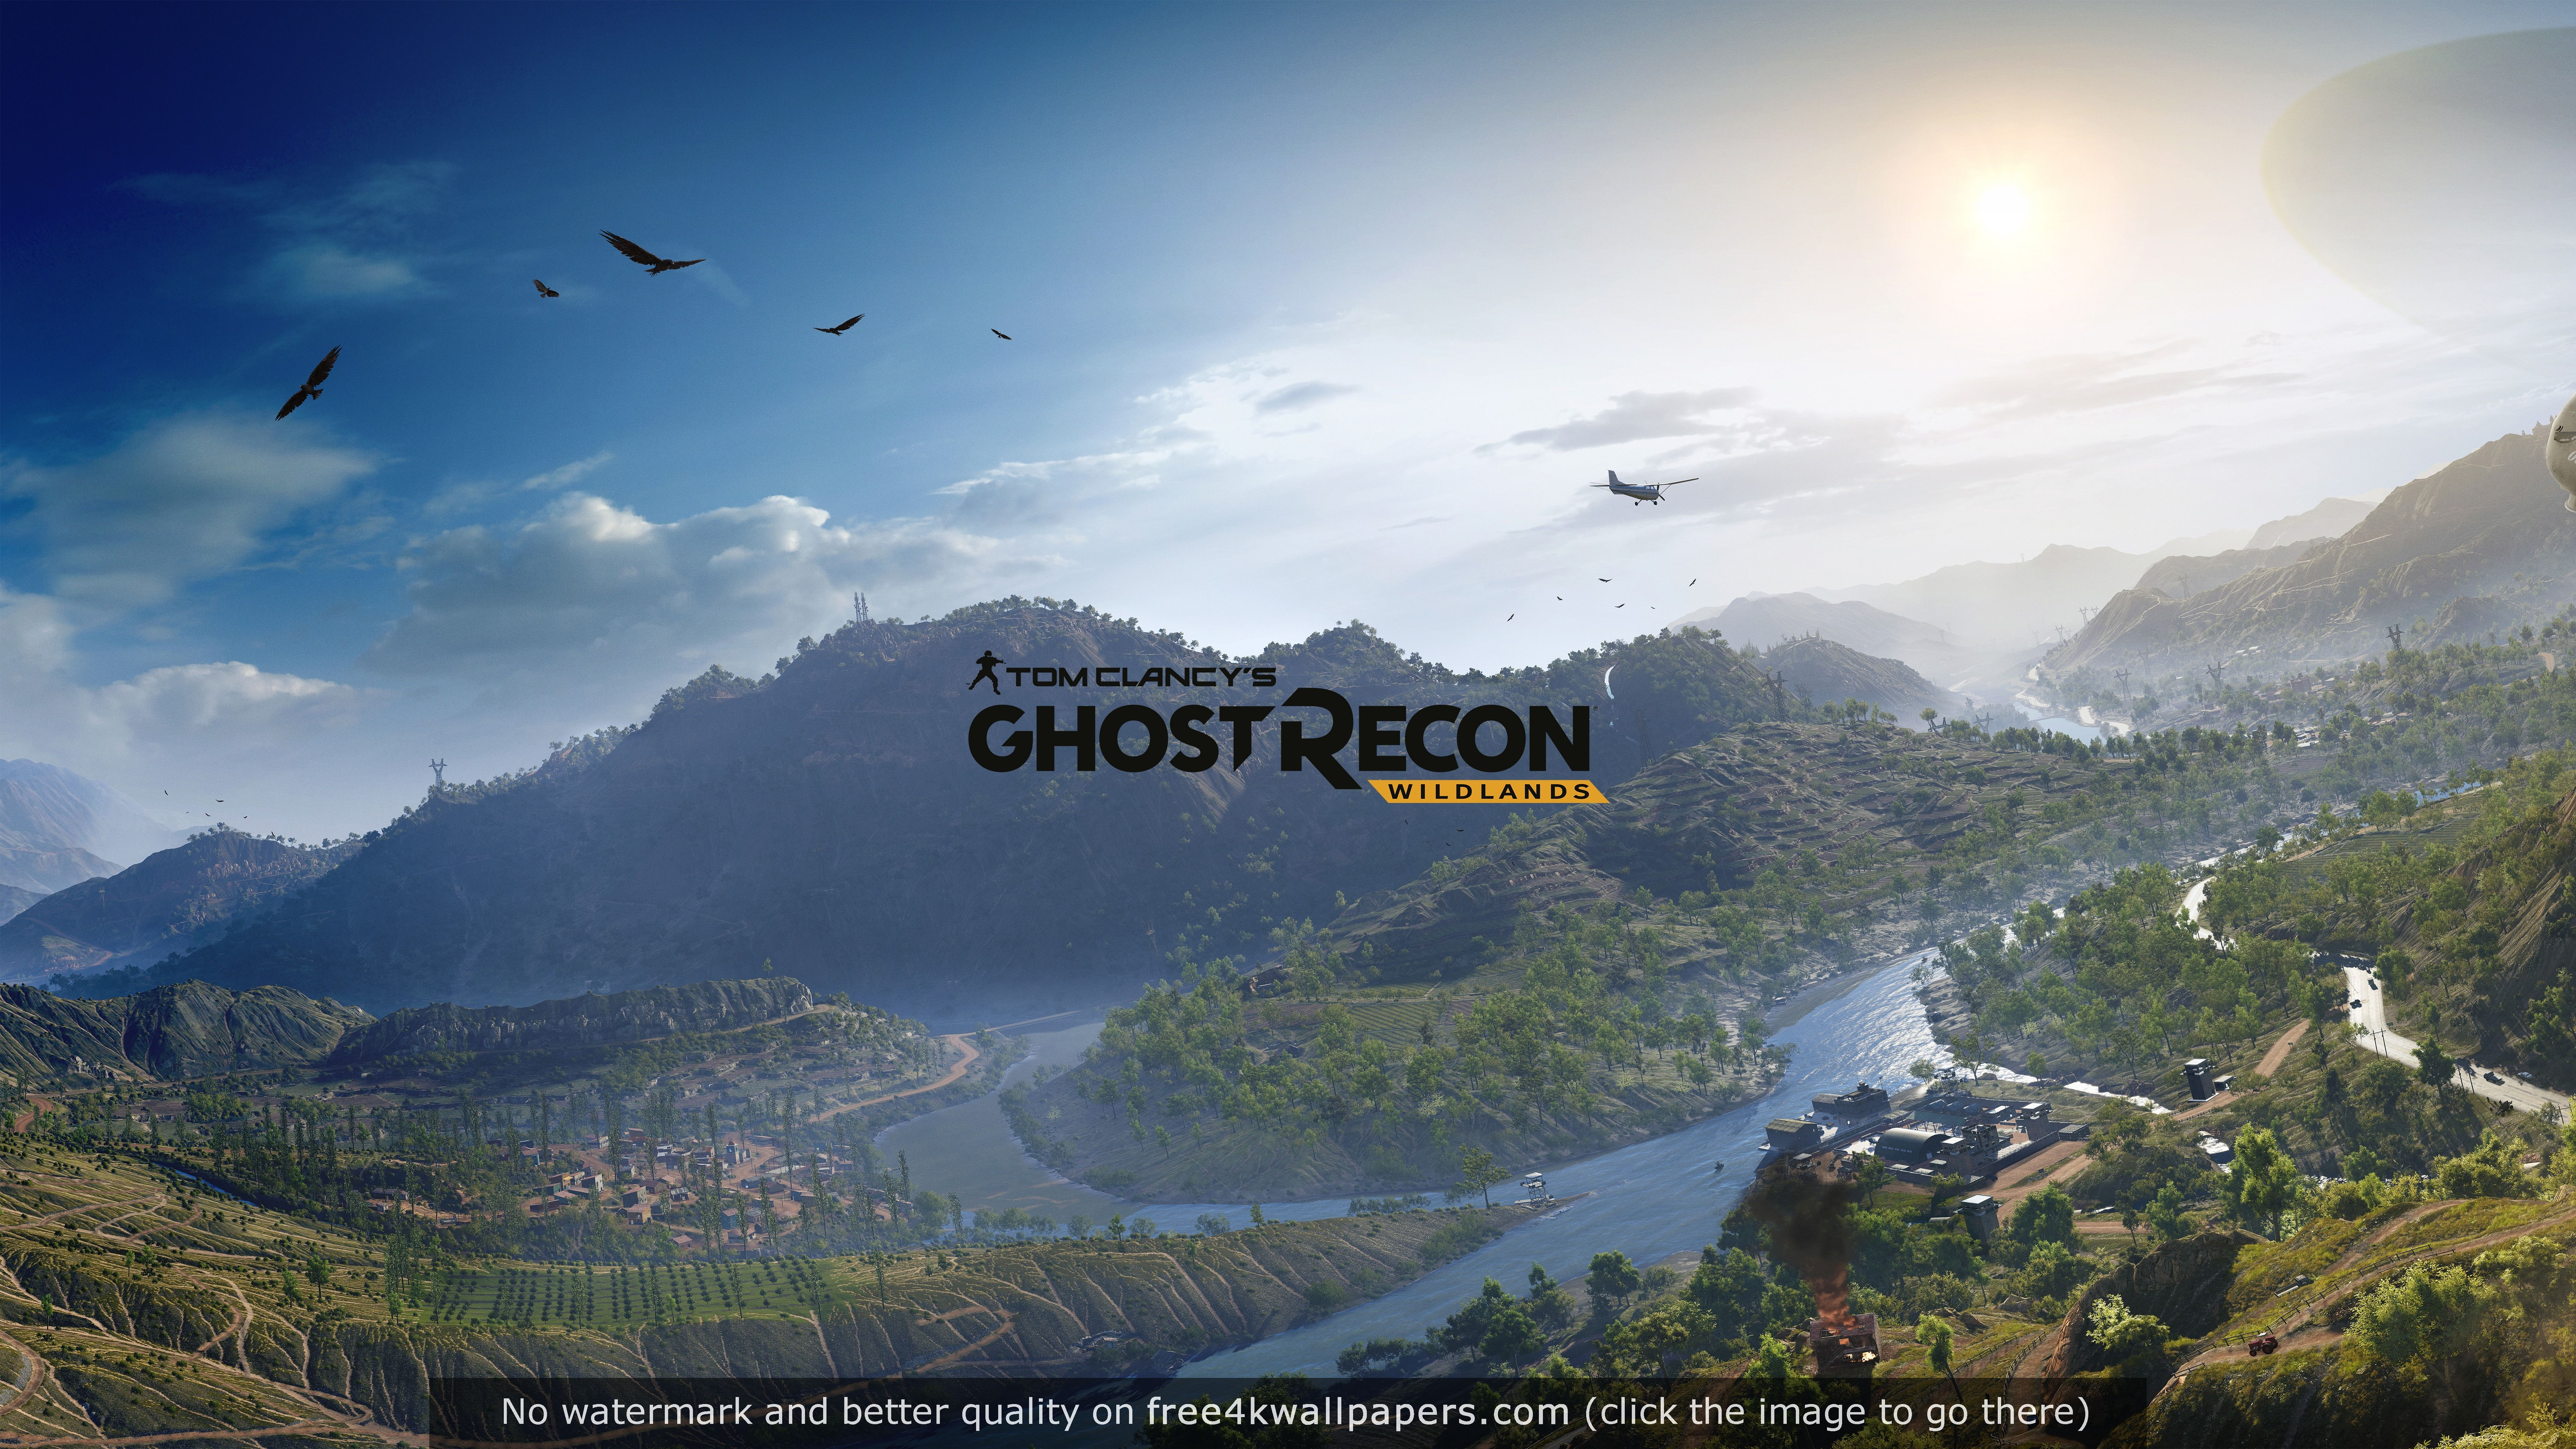 Ghost Recon Wildlands 4k 8k Wallpaper Ghost Recon Wildlands